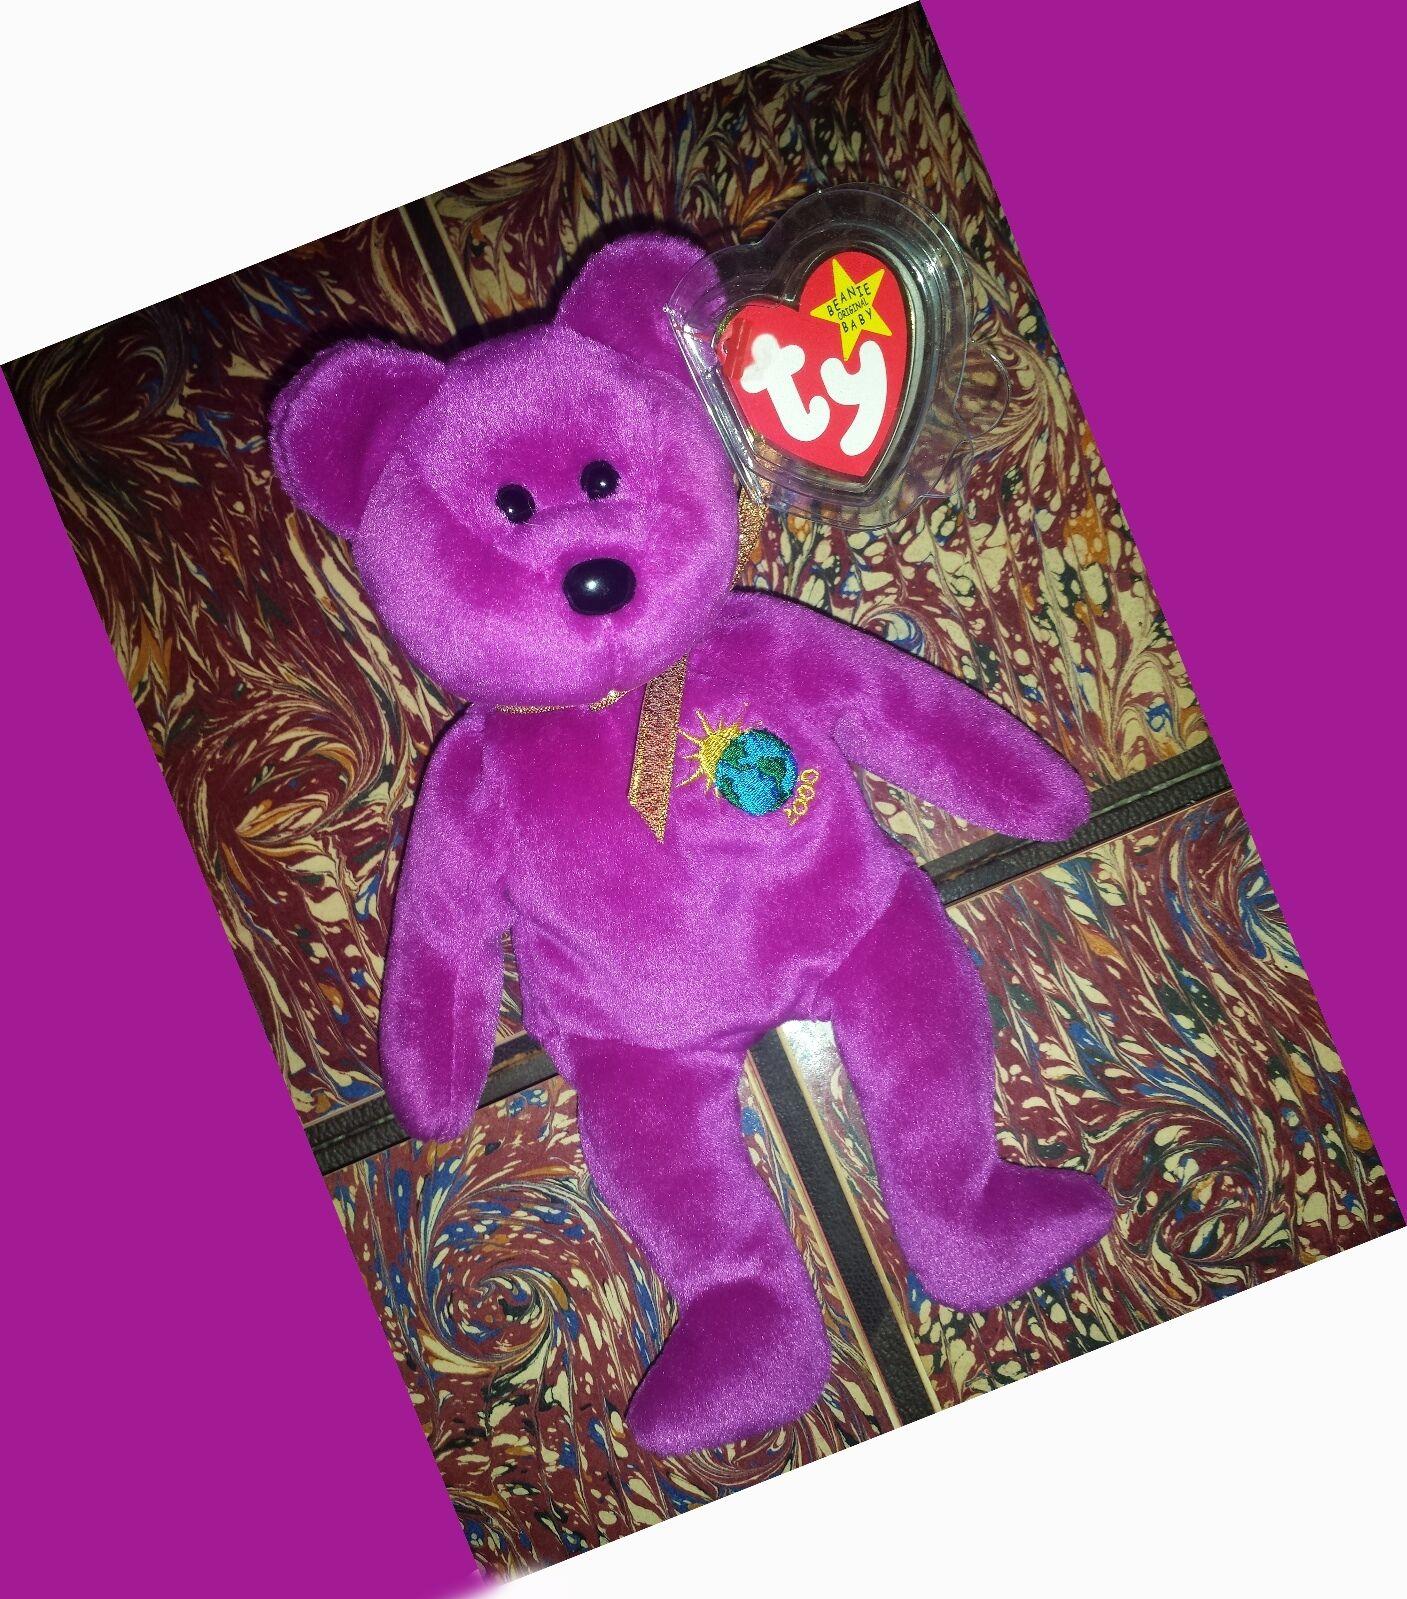 RARE MILLENIUM TY BEANIE BEANIE BEANIE BABY BEAR 1999 PE RETIRED MILLENNIUM GASPORT NO STAMP 456f7e